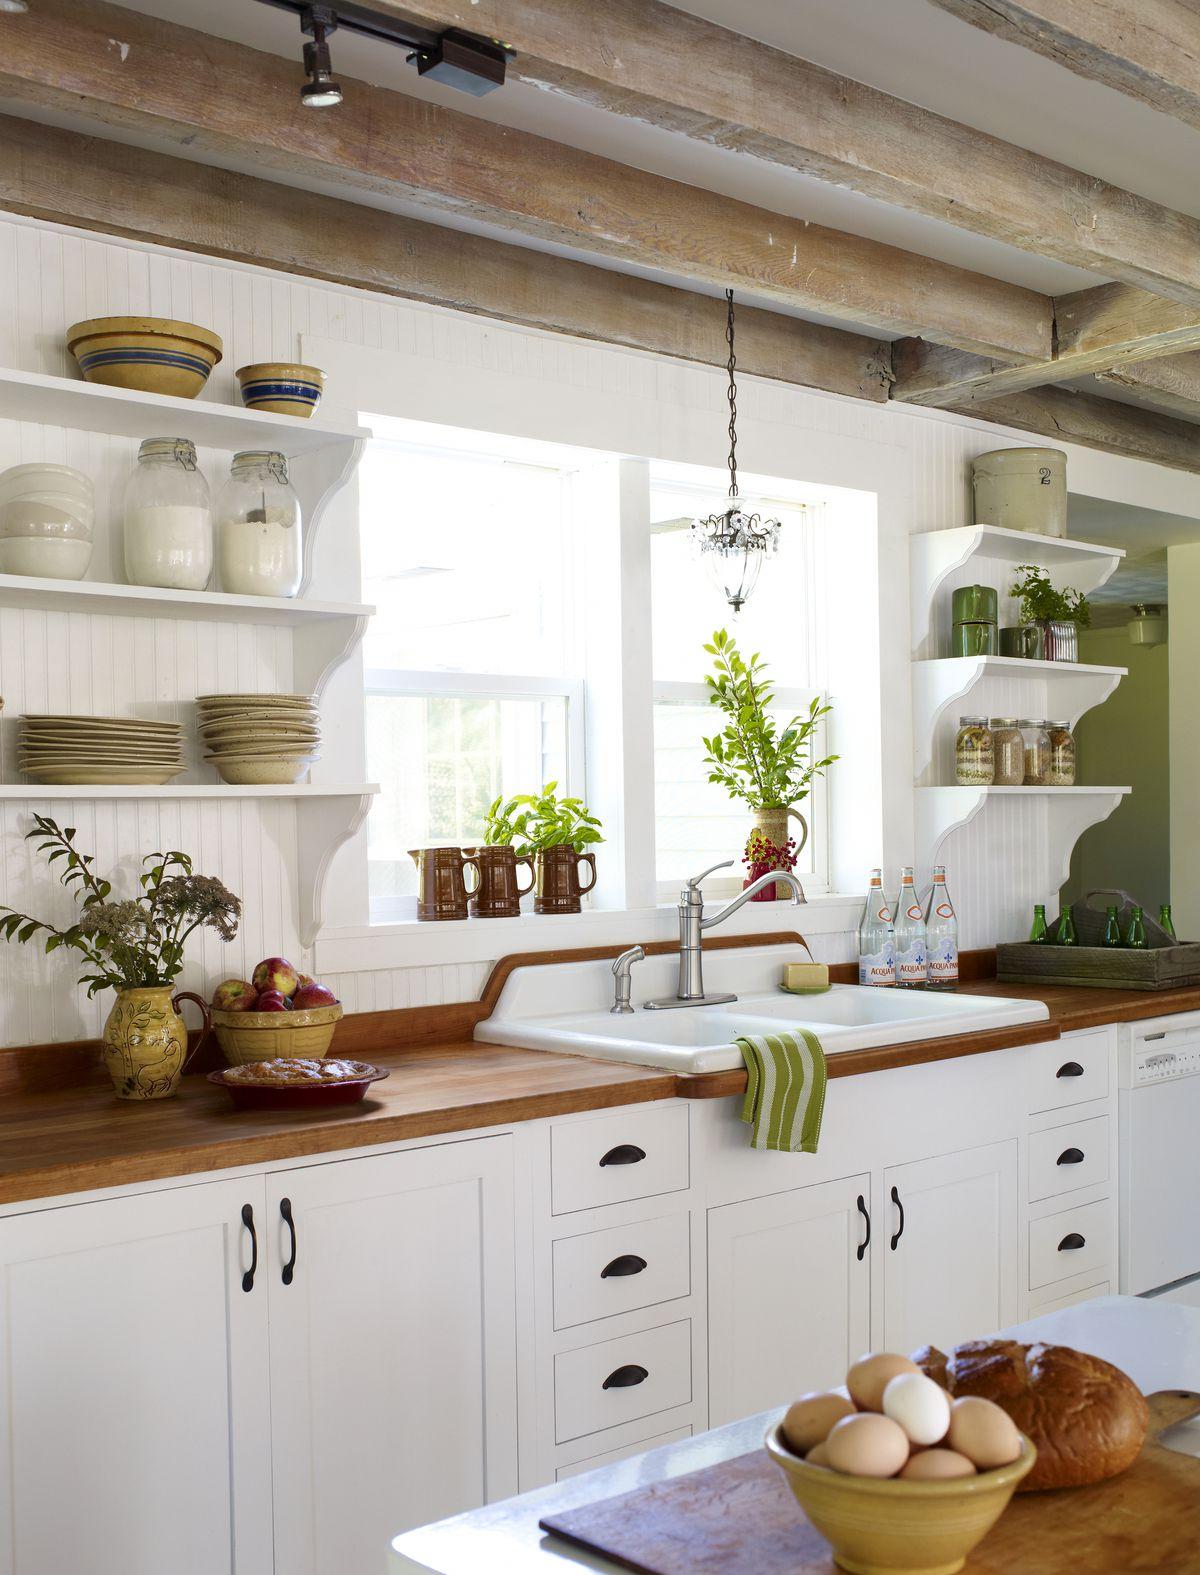 Farmhouse style wood countertop in kitchen.